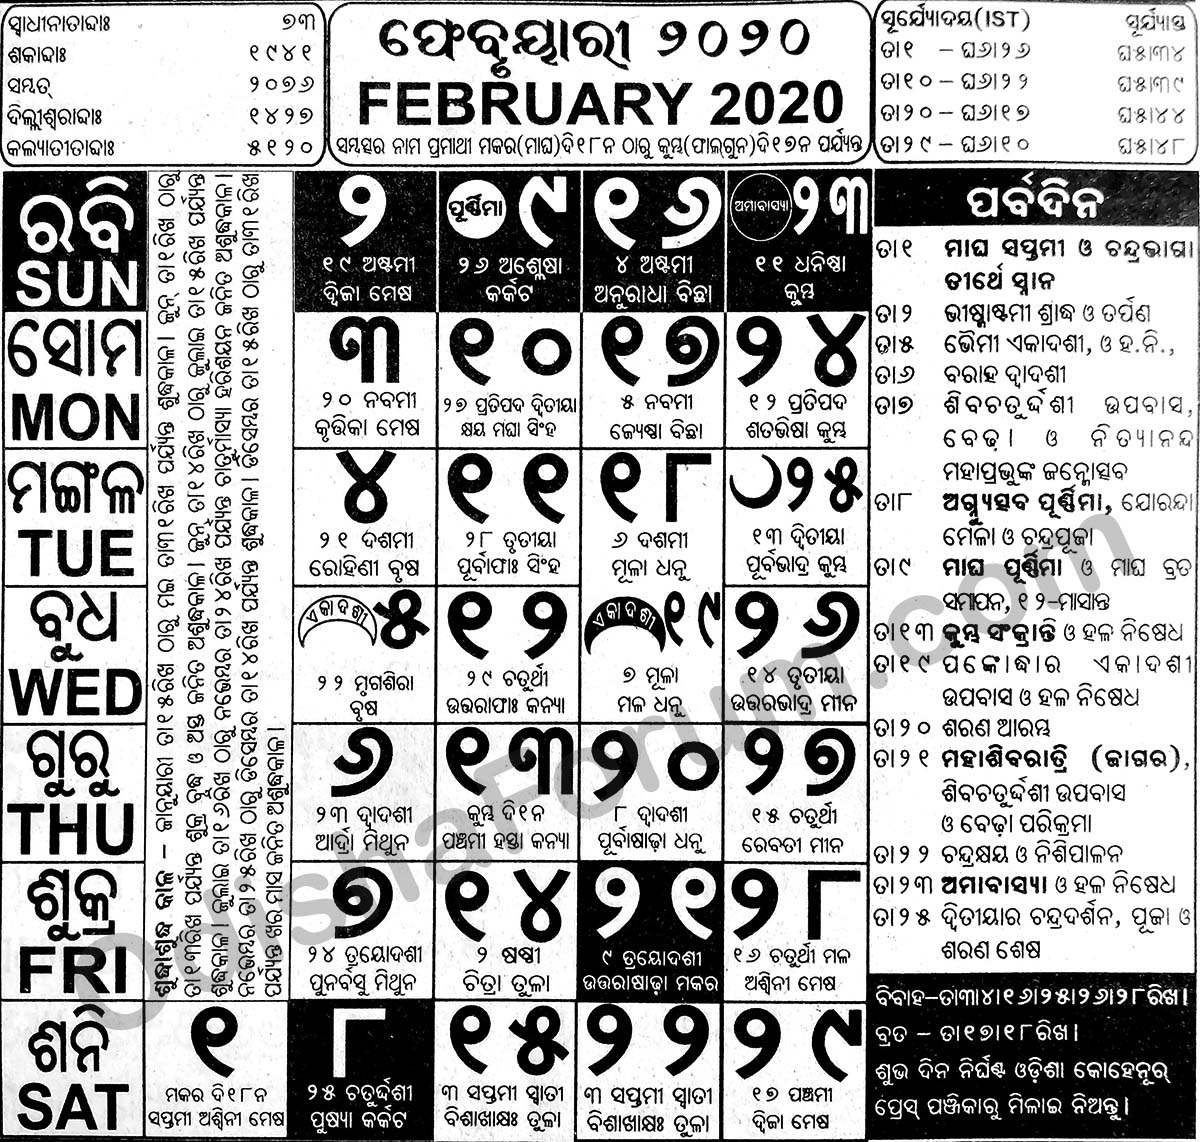 2020 February Oriya Calendar